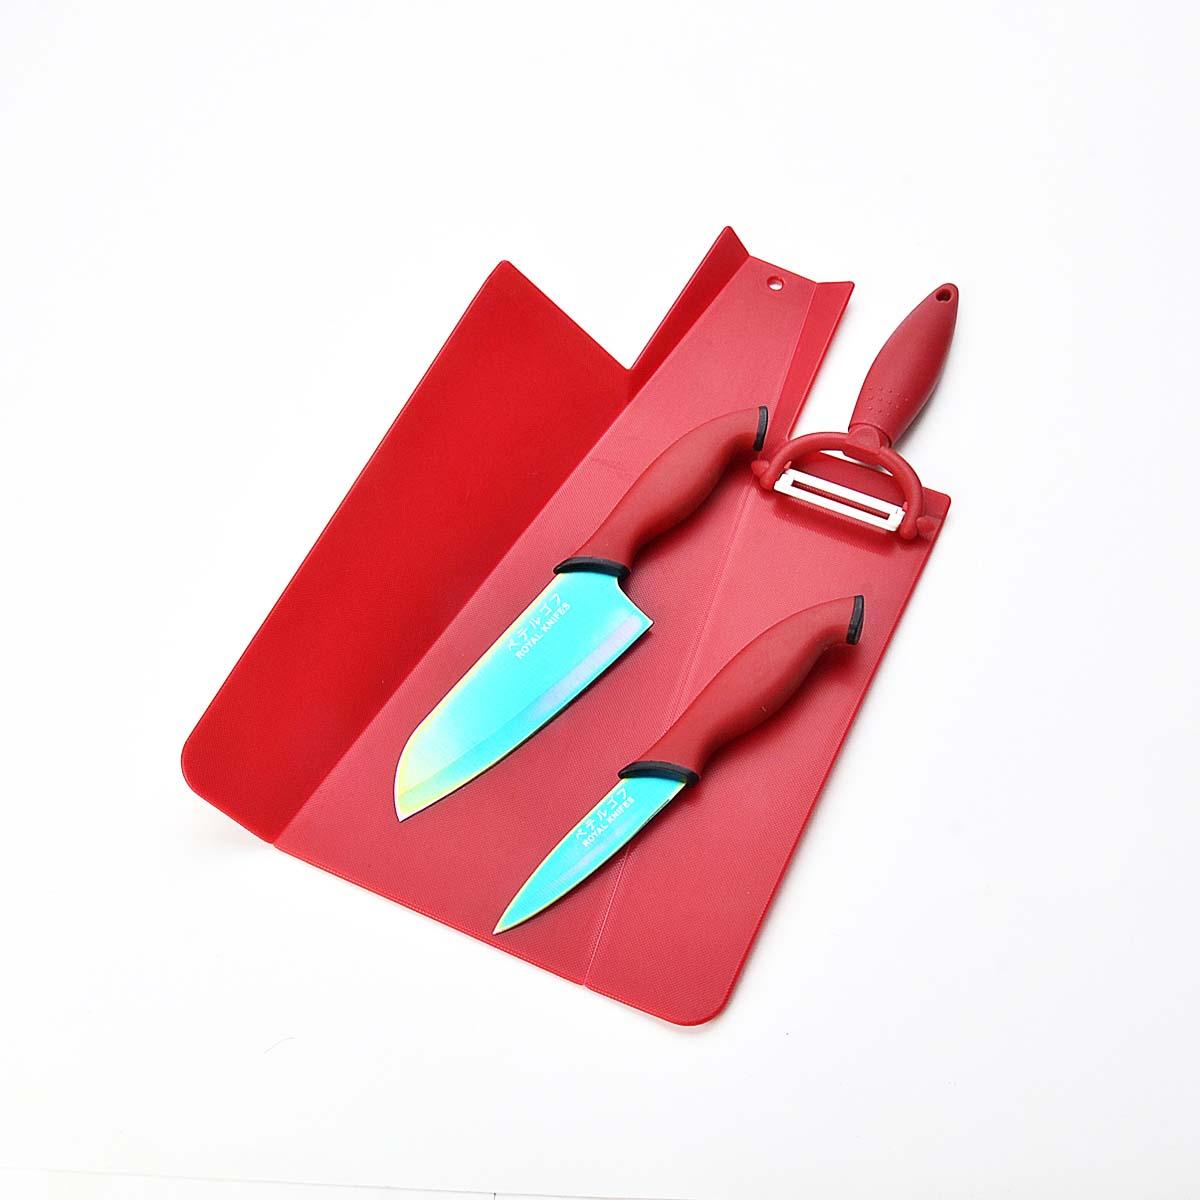 407 Набор ножей с антибактериальным покр+овощ.с керамич.лезвием+доска разд. пласт. 4пр. 21579 кухонный набор 4пр гуси 906510